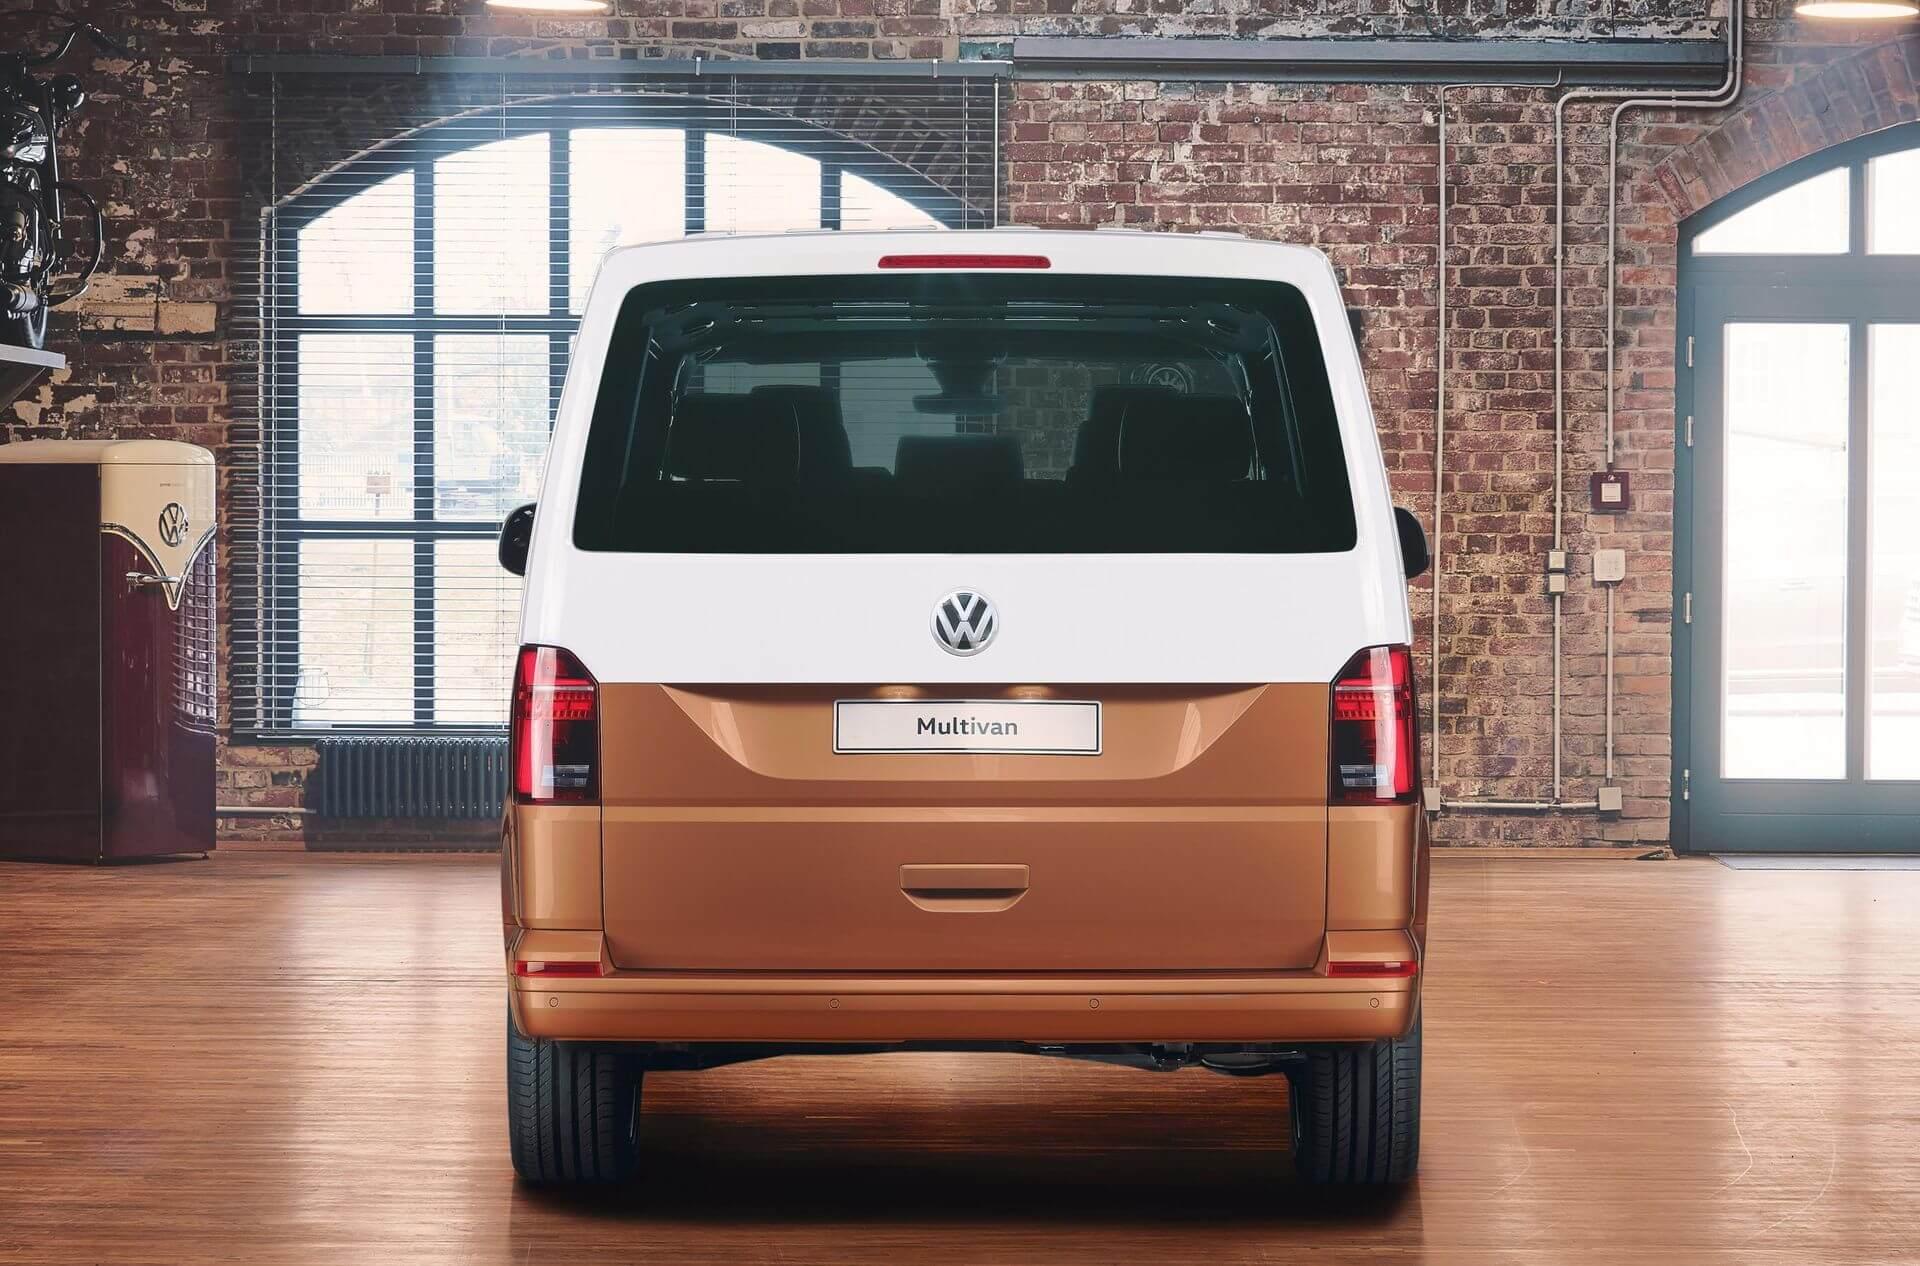 Электрический фургон Volkswagen Multivan Т6.1 - вид сзади